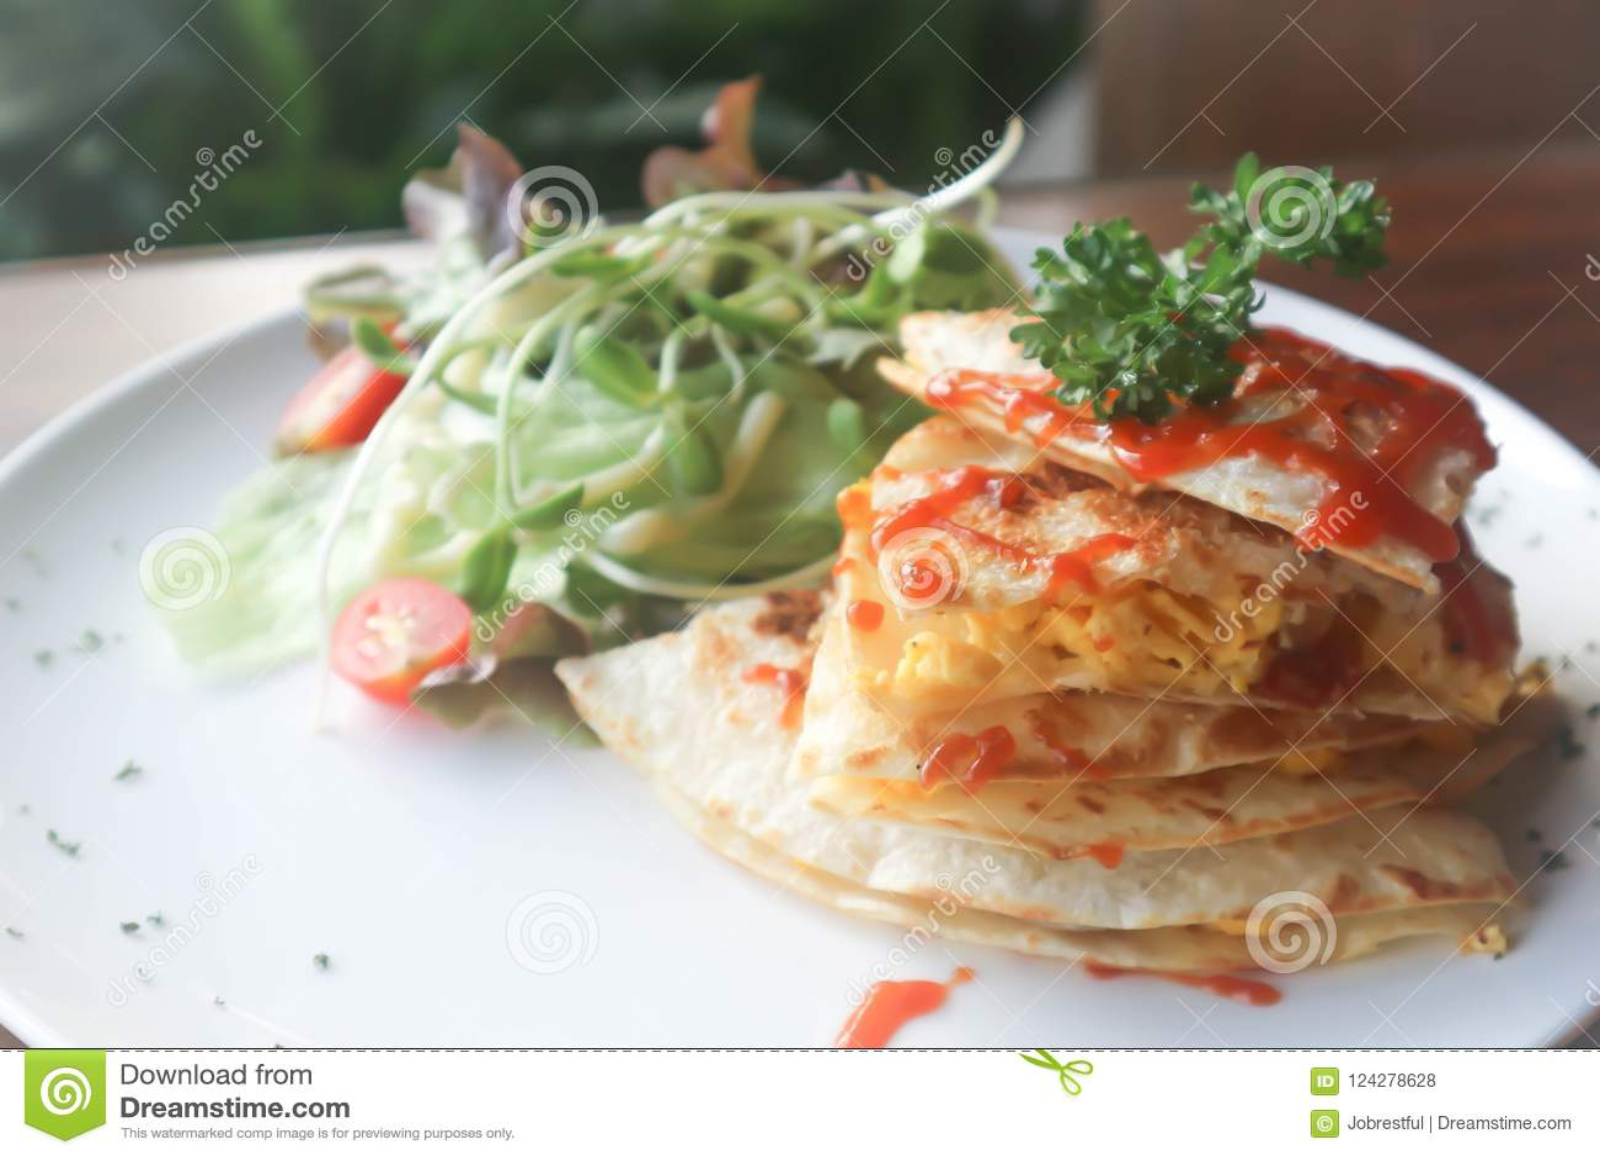 Quesadillas or Tortilla with egg